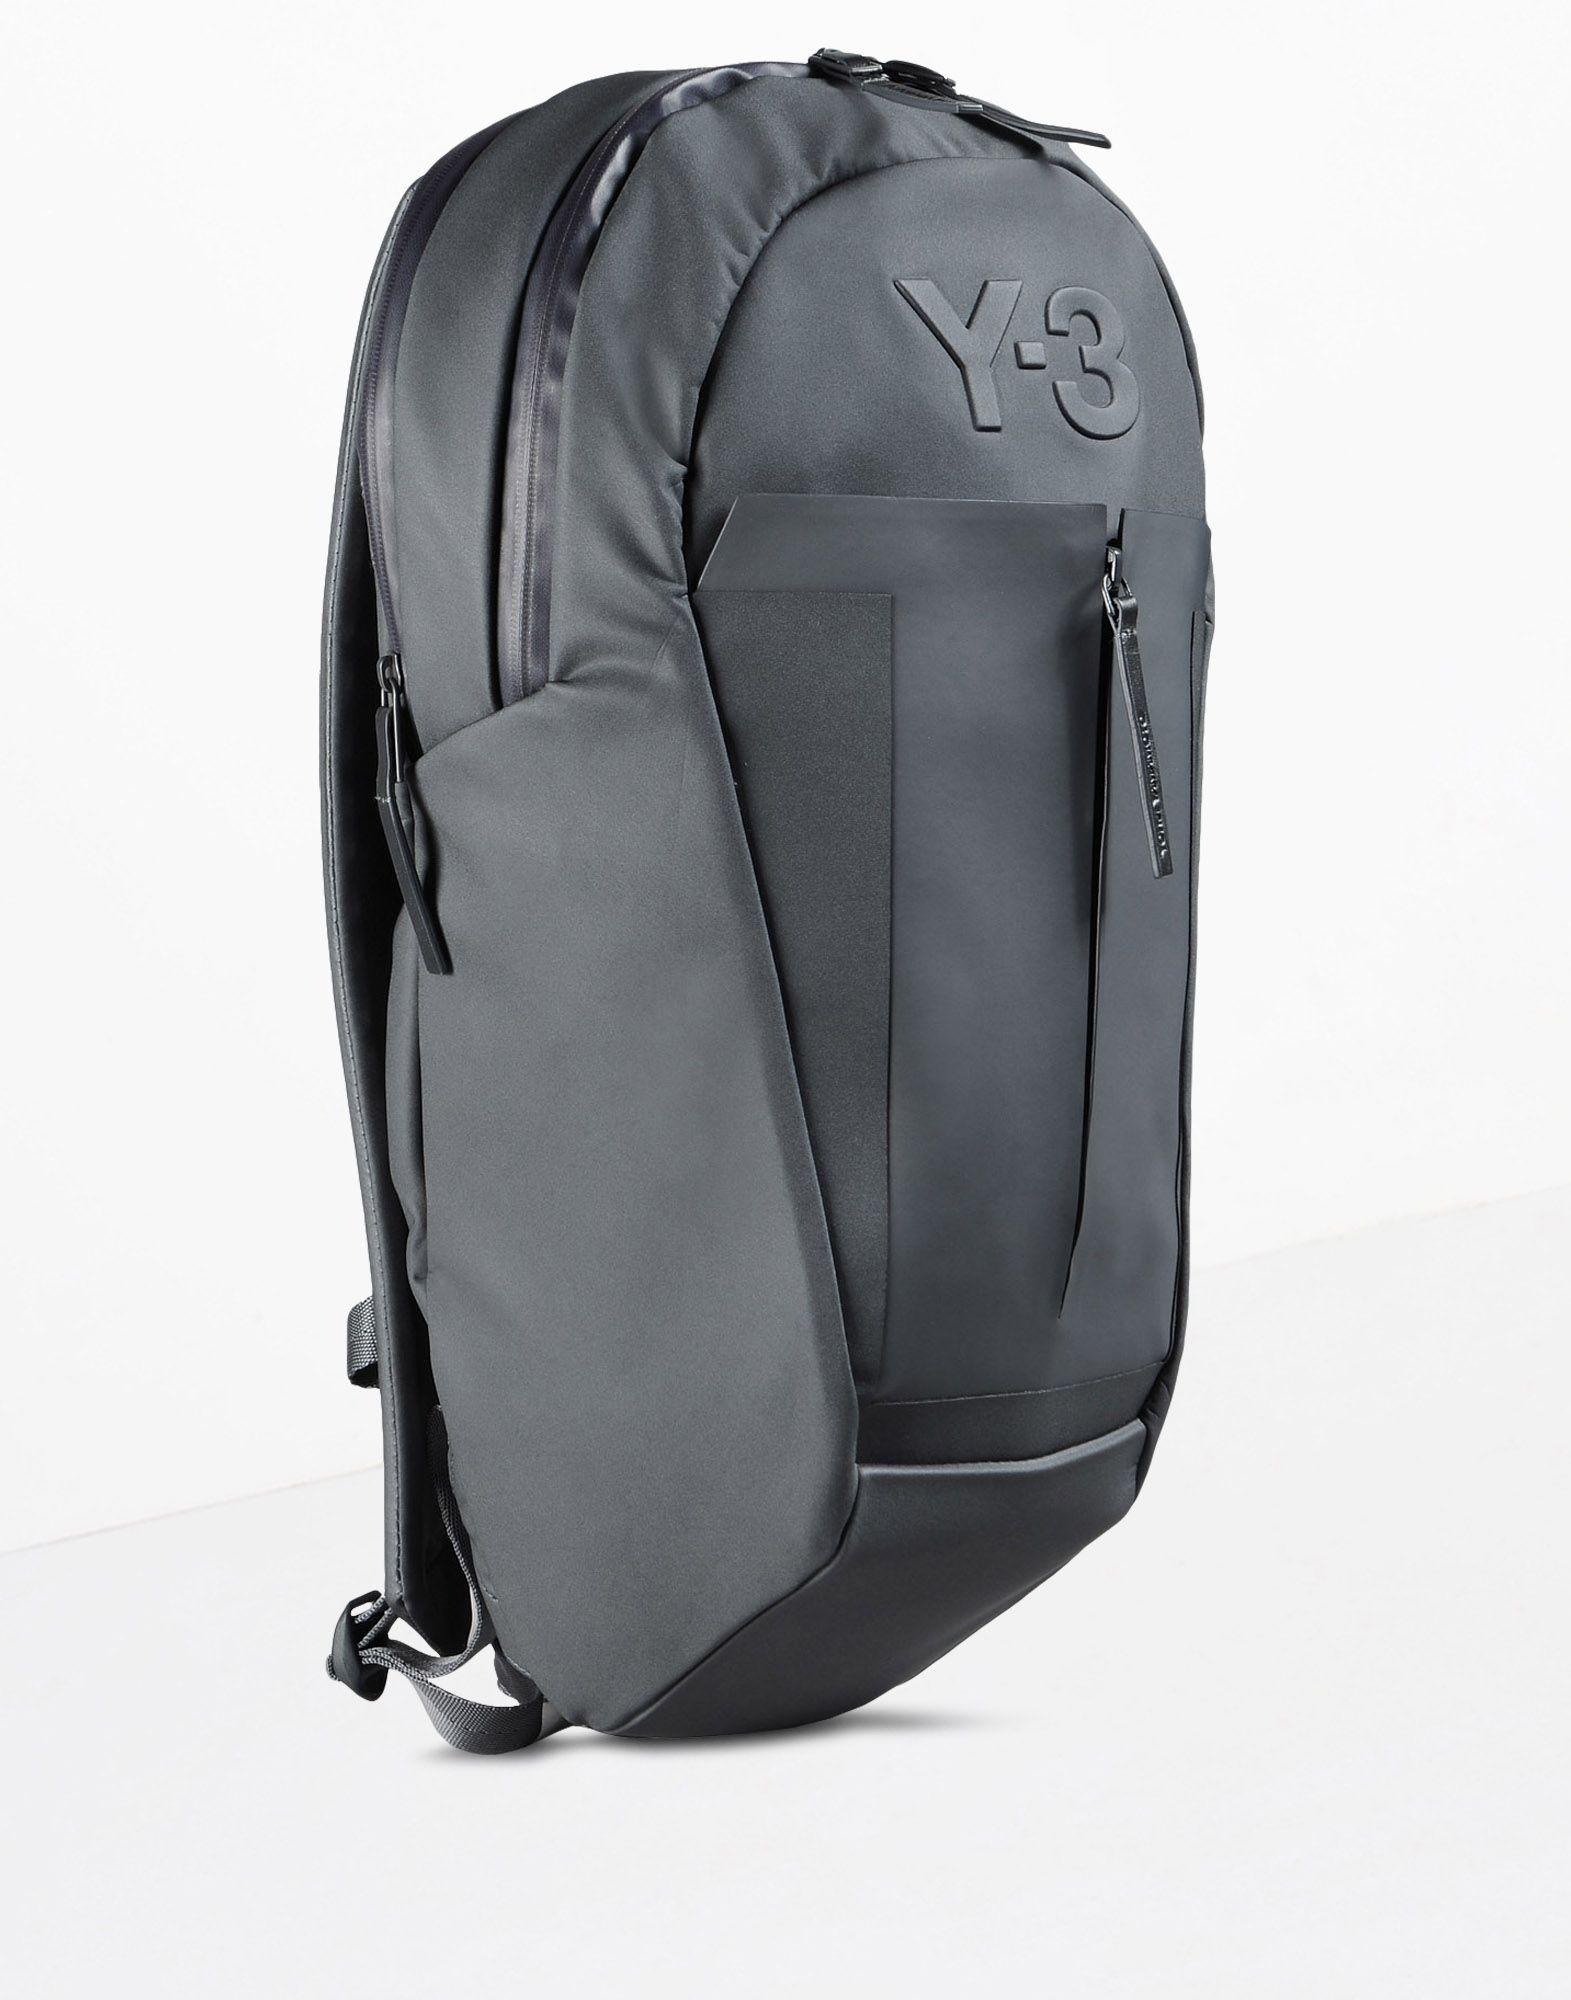 Y Morral Backpack AdidasBags Unisex 3 Handbags Bolso OiZkXPu